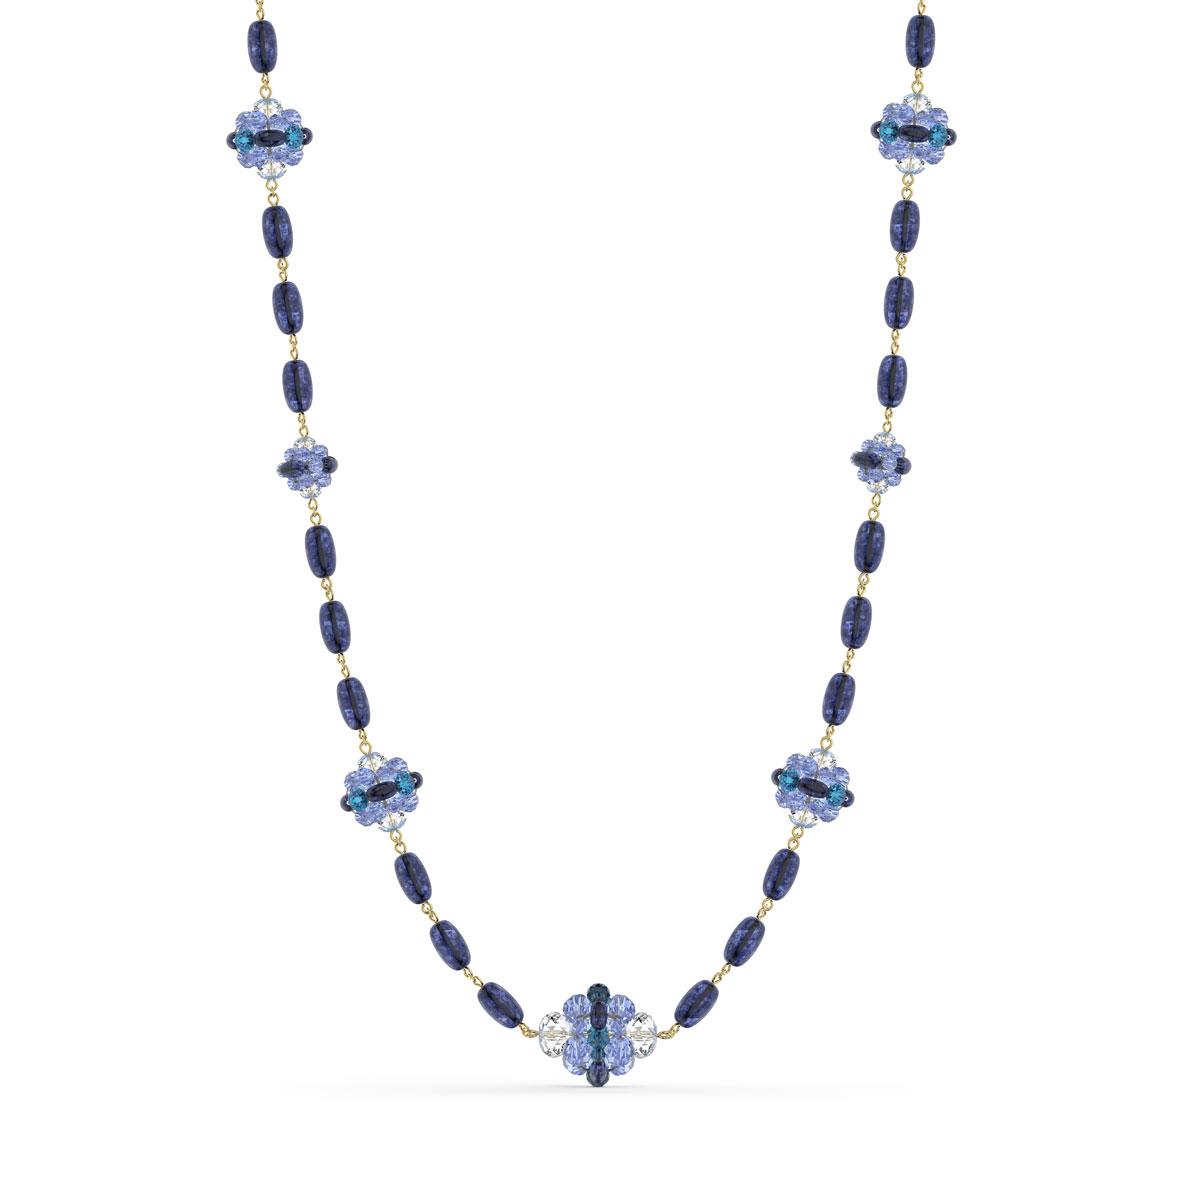 Swarovski Somnia Necklace, Extra Long, Blue, Gold-Tone Plated